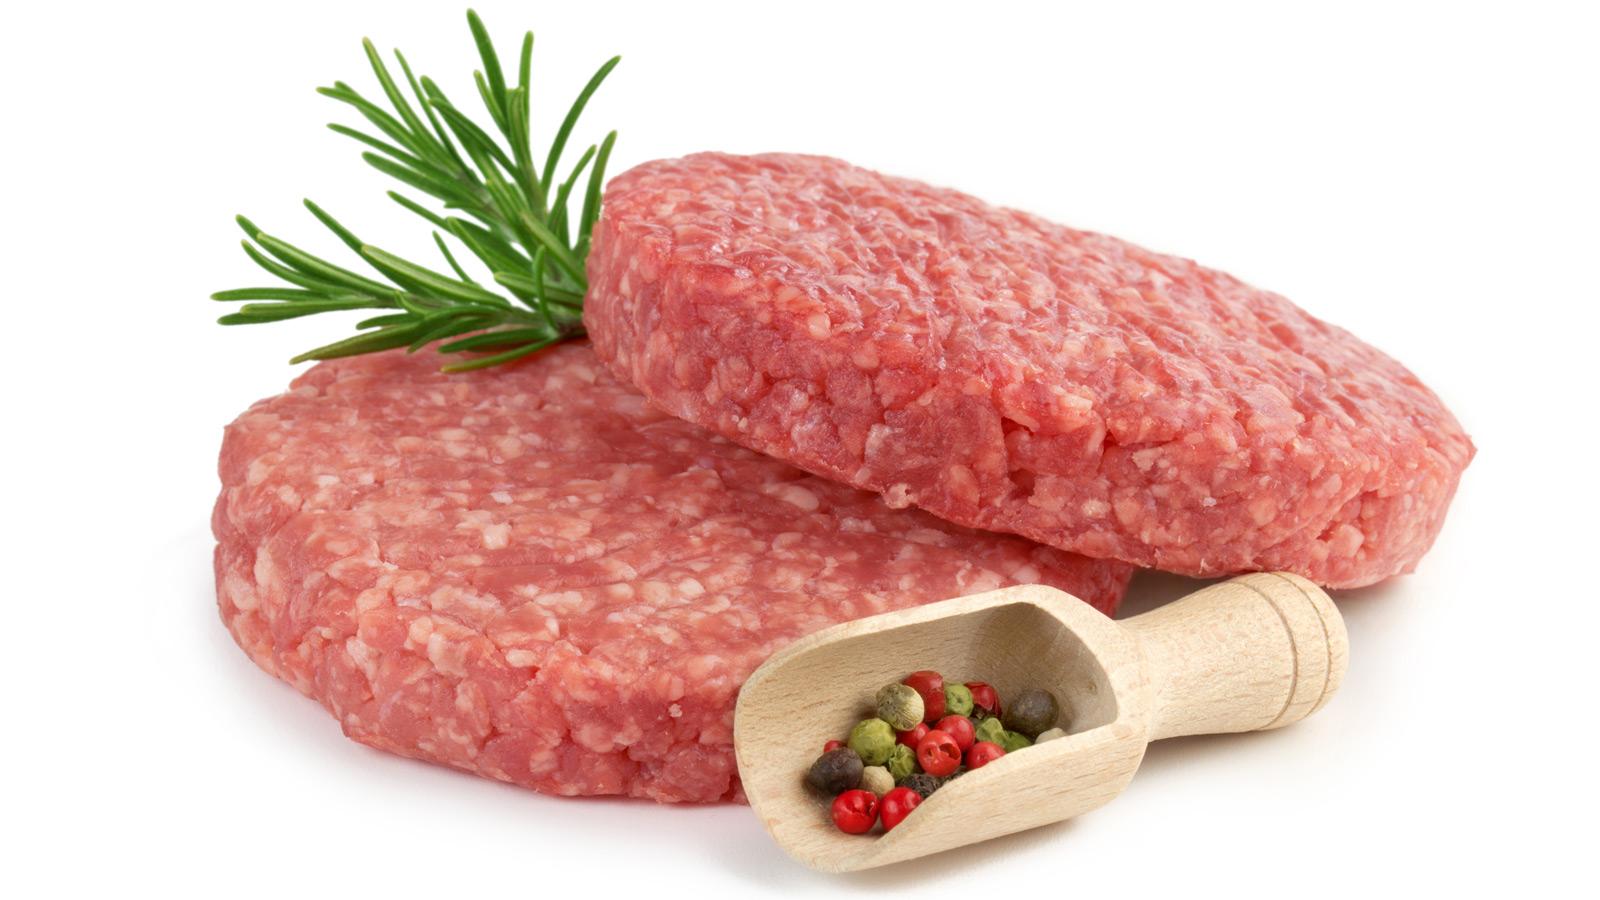 Hambúrgueres e carne picada